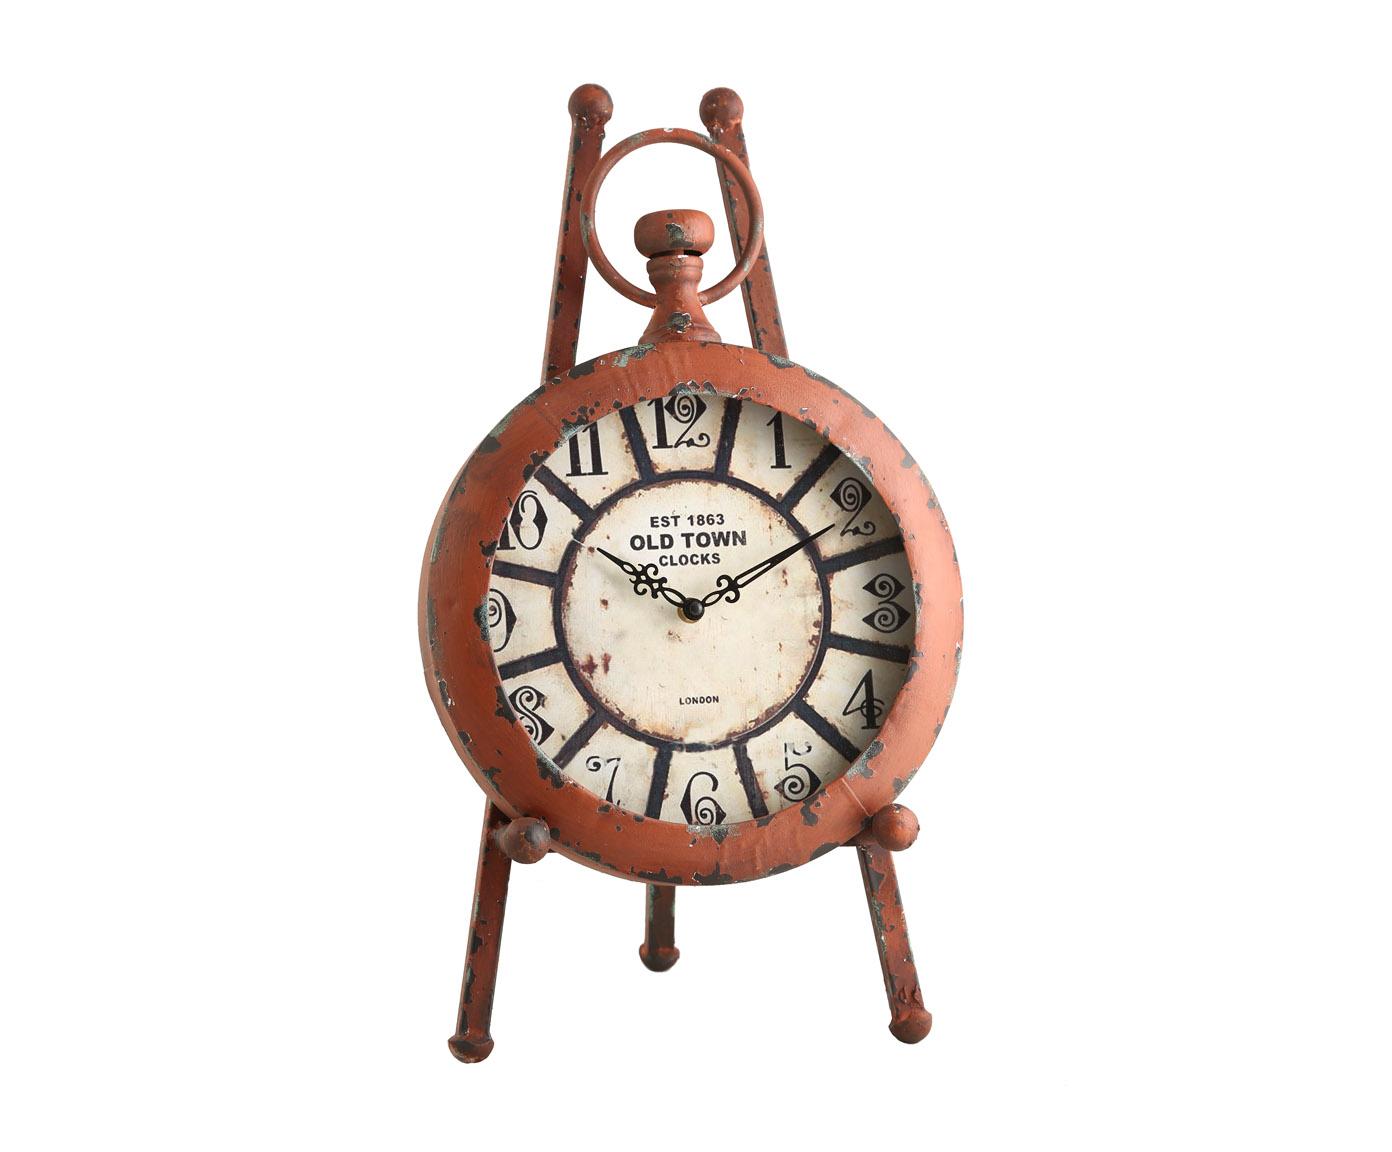 Часы настольныеНастольные часы<br>кварцевый механизм, работают от батарейки типа АА<br><br>Material: Металл<br>Width см: 35<br>Depth см: 8<br>Height см: 50